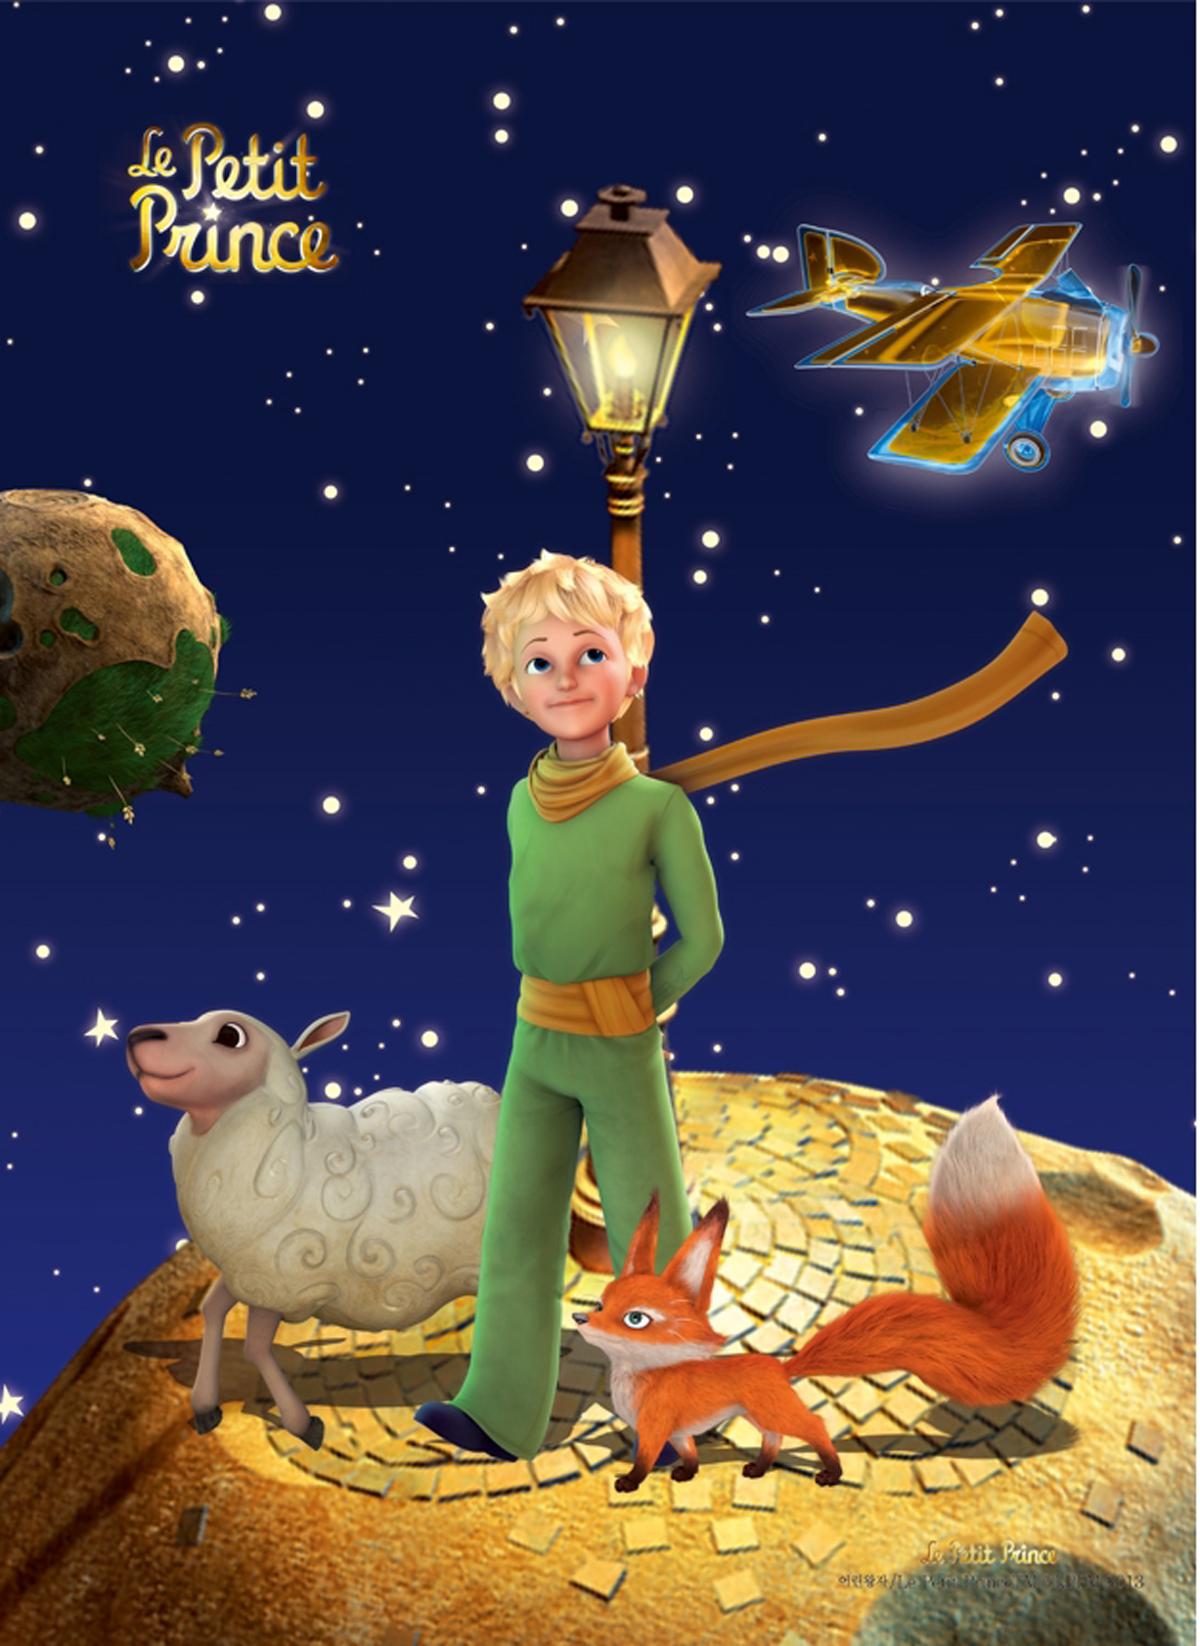 Le Petit Prince Sheep & Fox Fantasy Jigsaw Puzzle